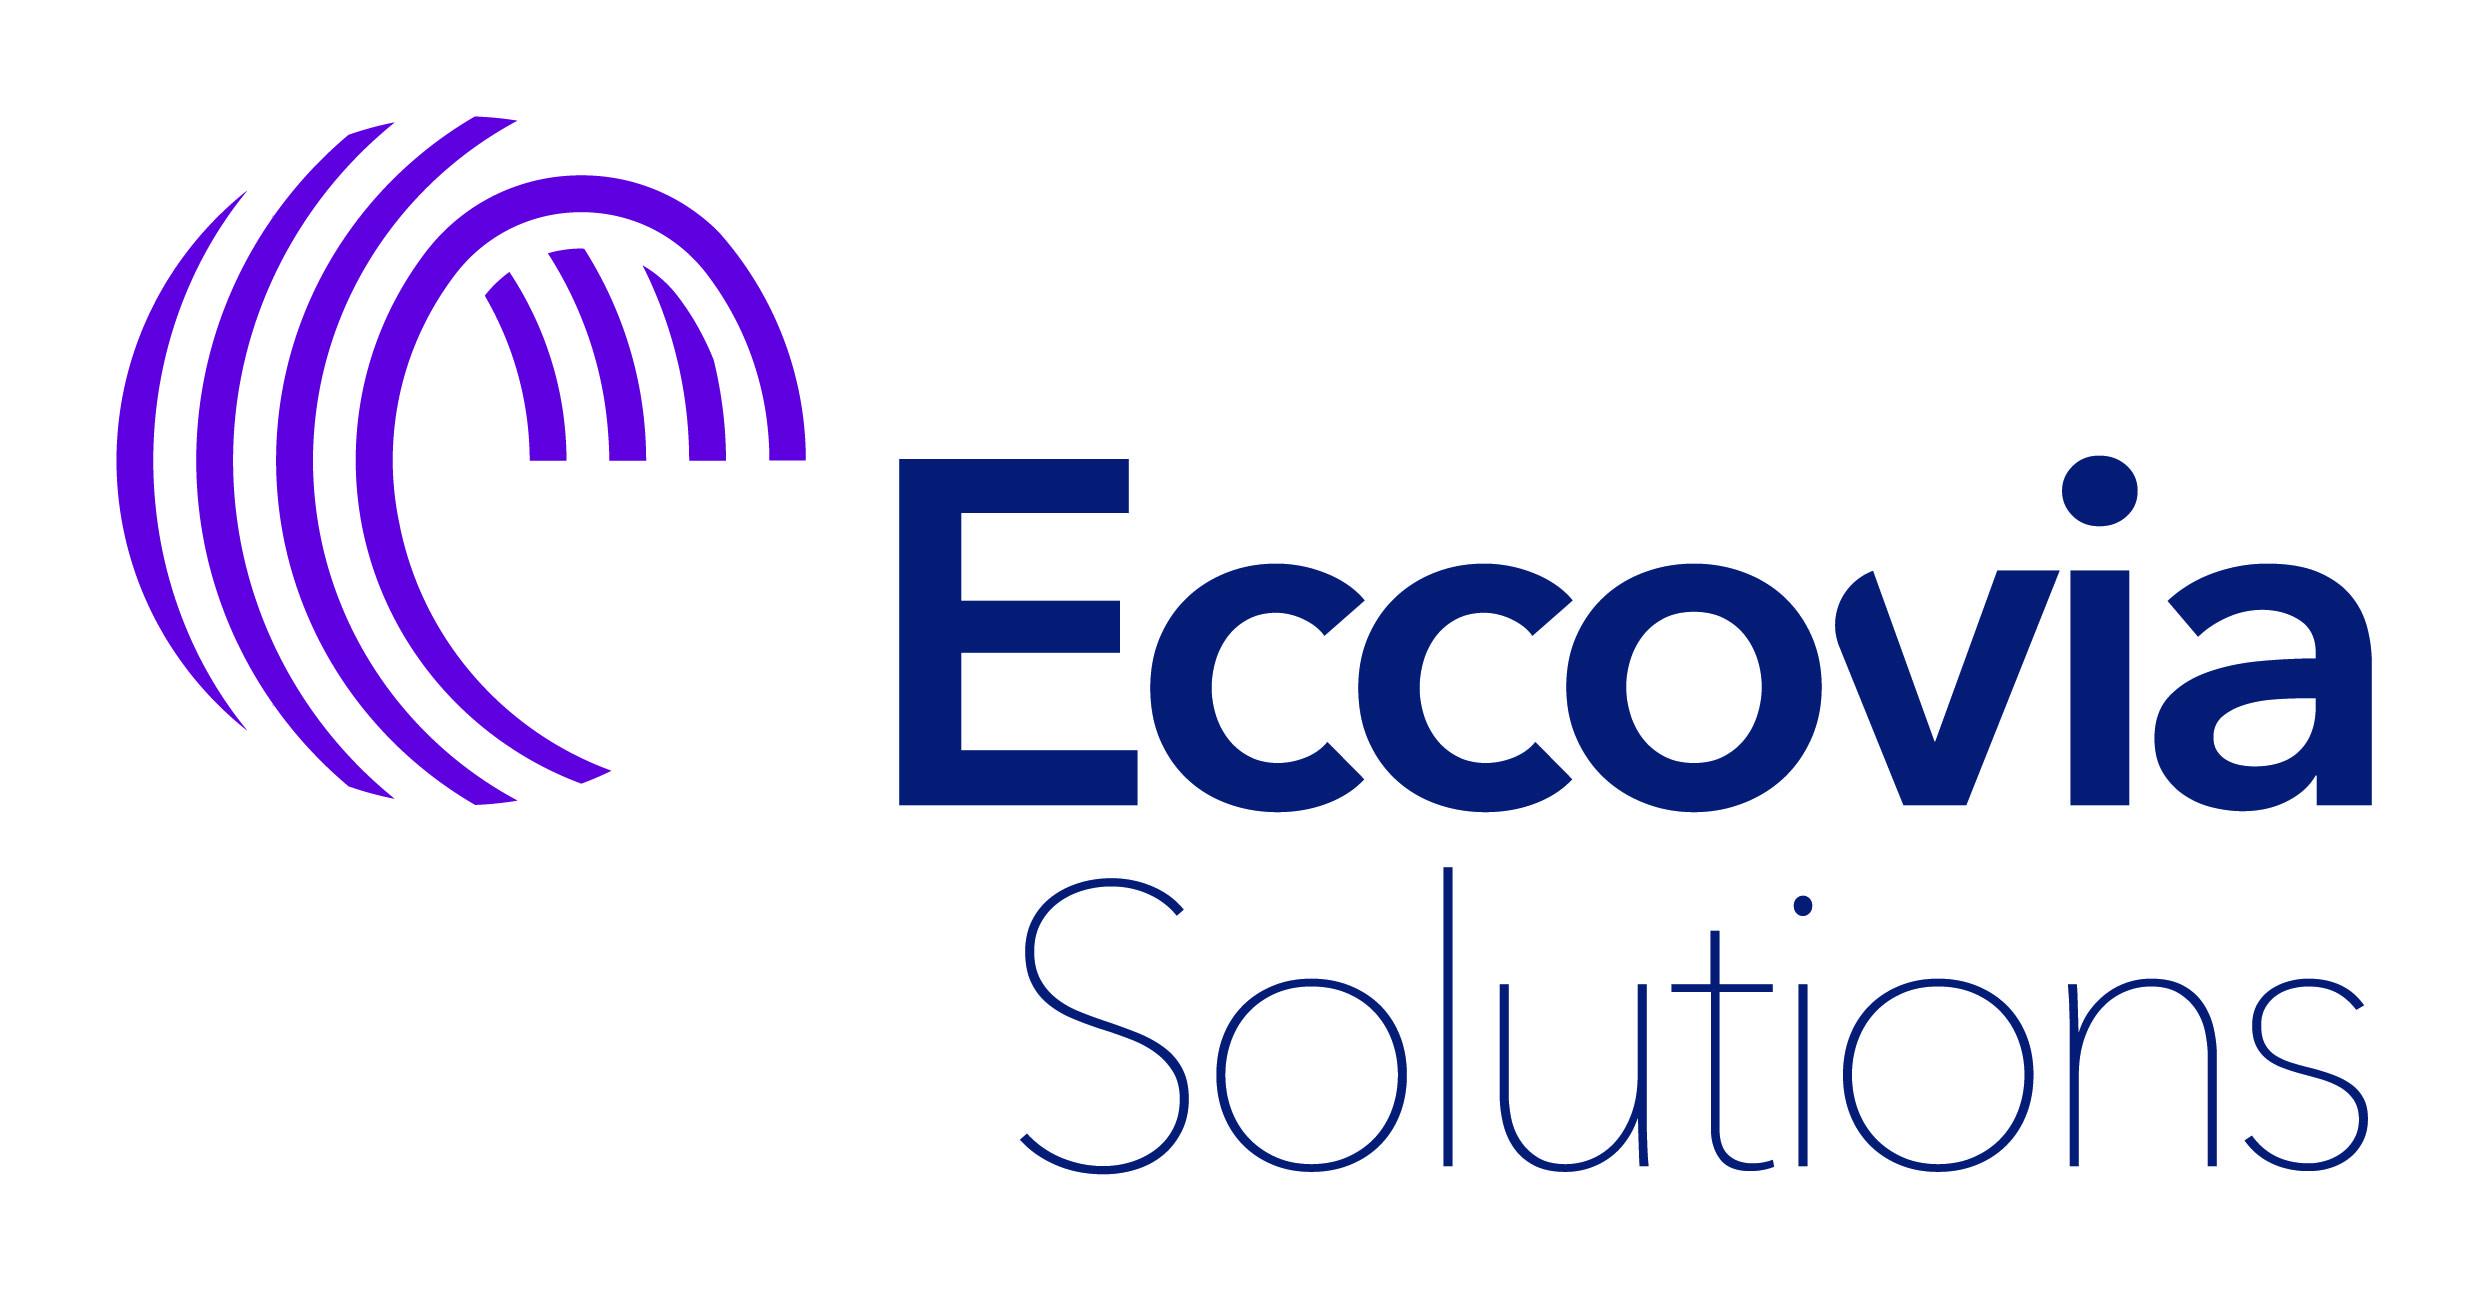 Eccovia Solutions Full Color Logo 091817-01